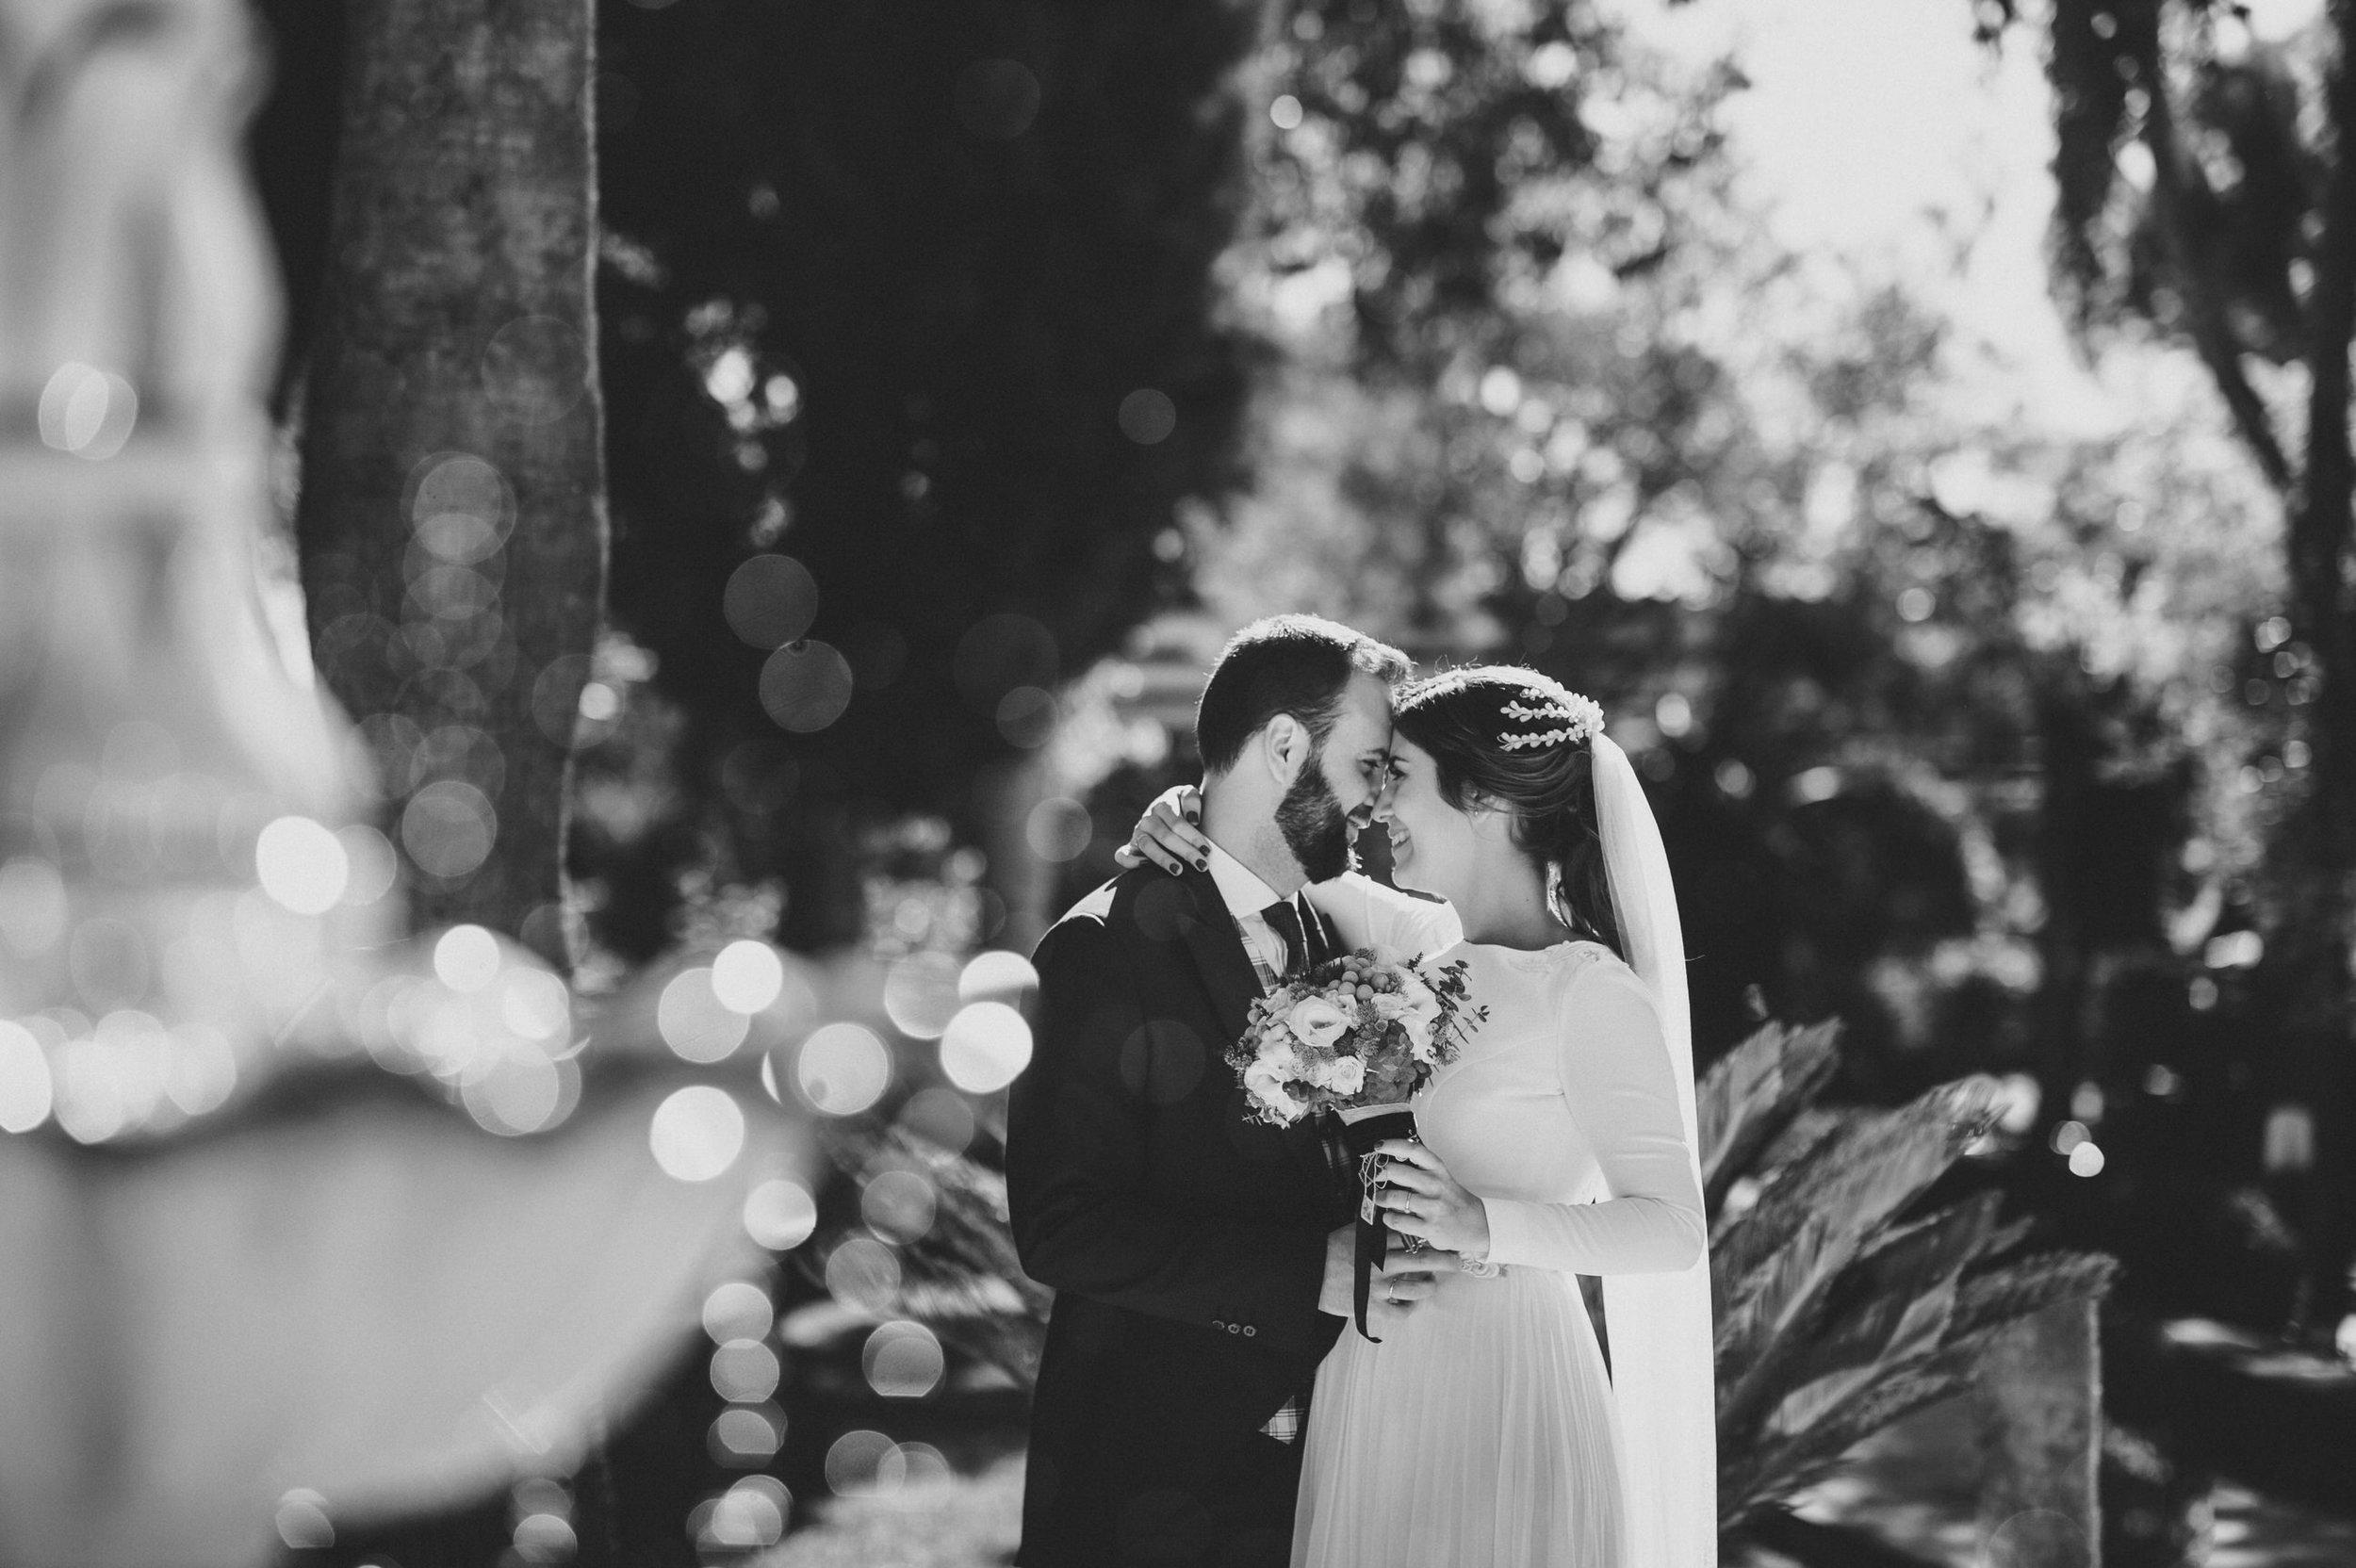 andres+amarillo+fotografo+boda+sevilla+santa+maria+de+la+blanca+al+yamanah (36).JPG